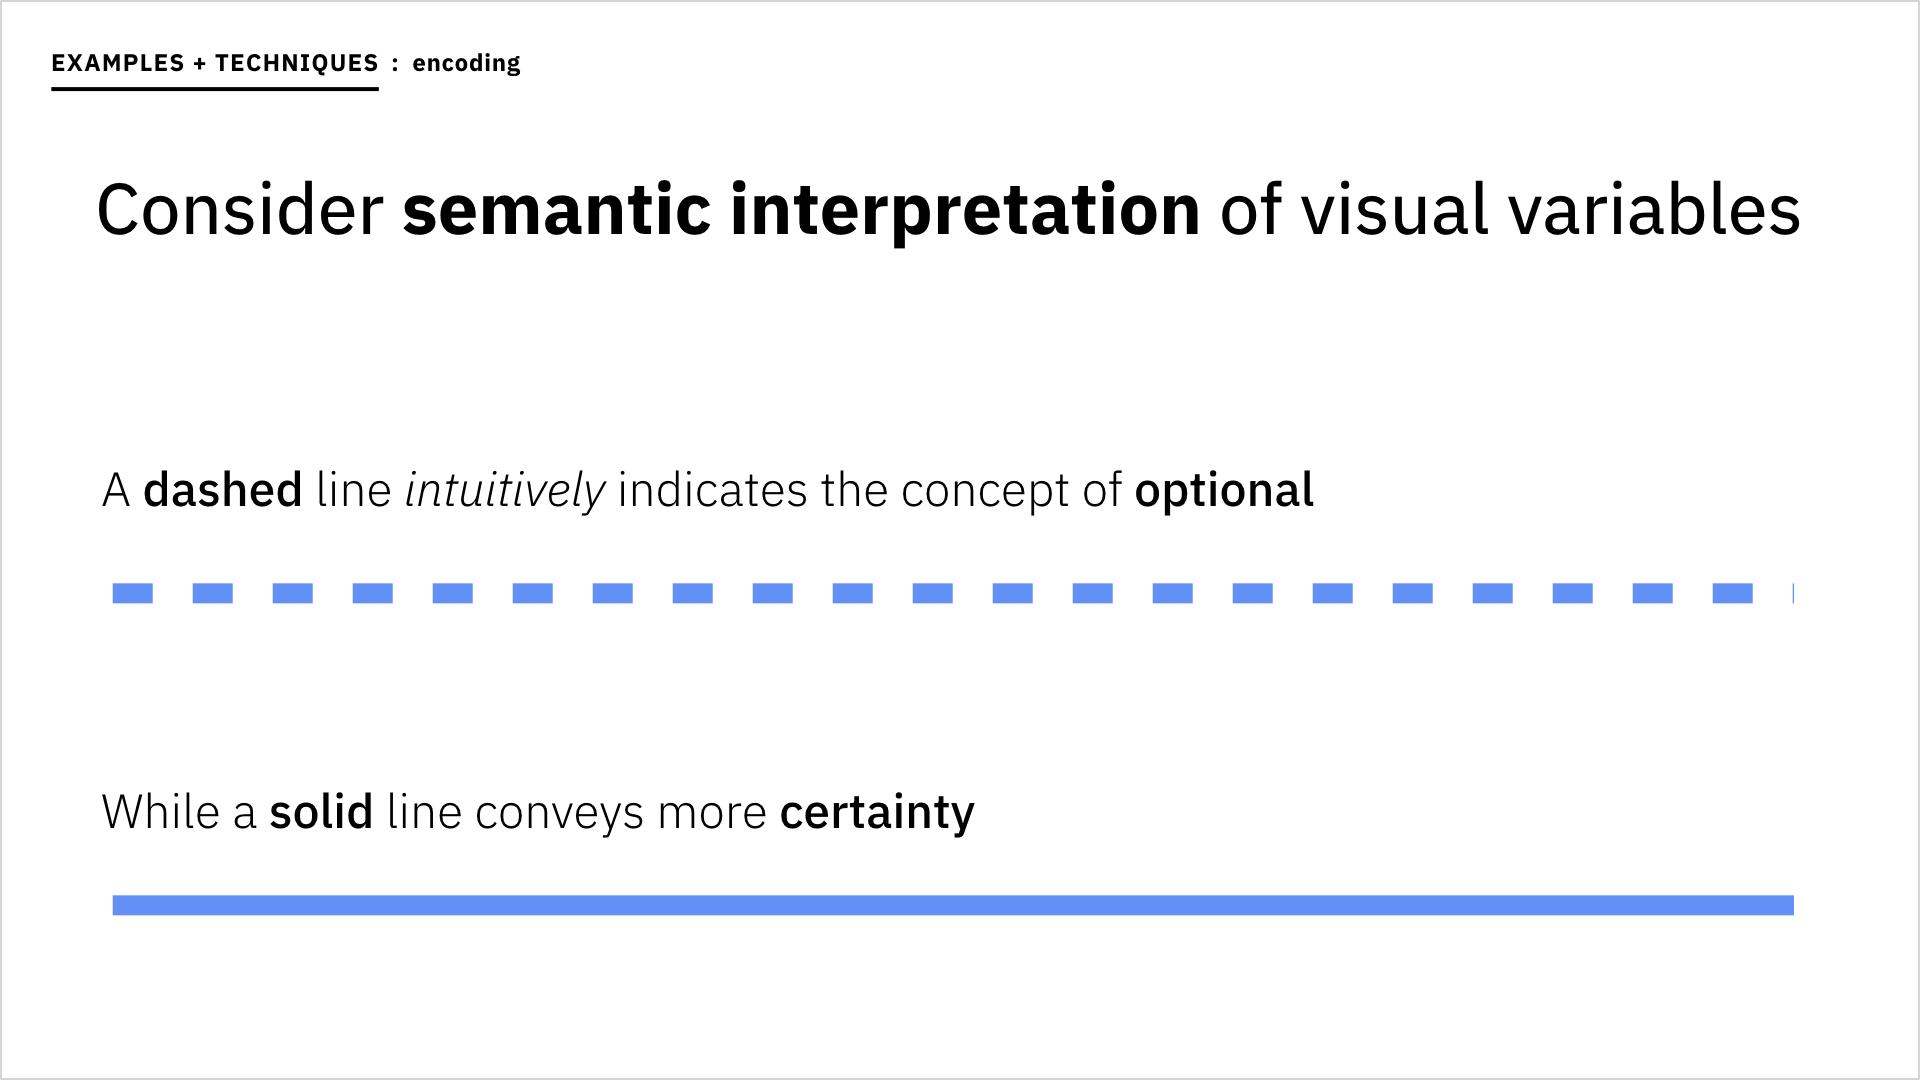 I also leaned into semantic interpretations of various visual variables.